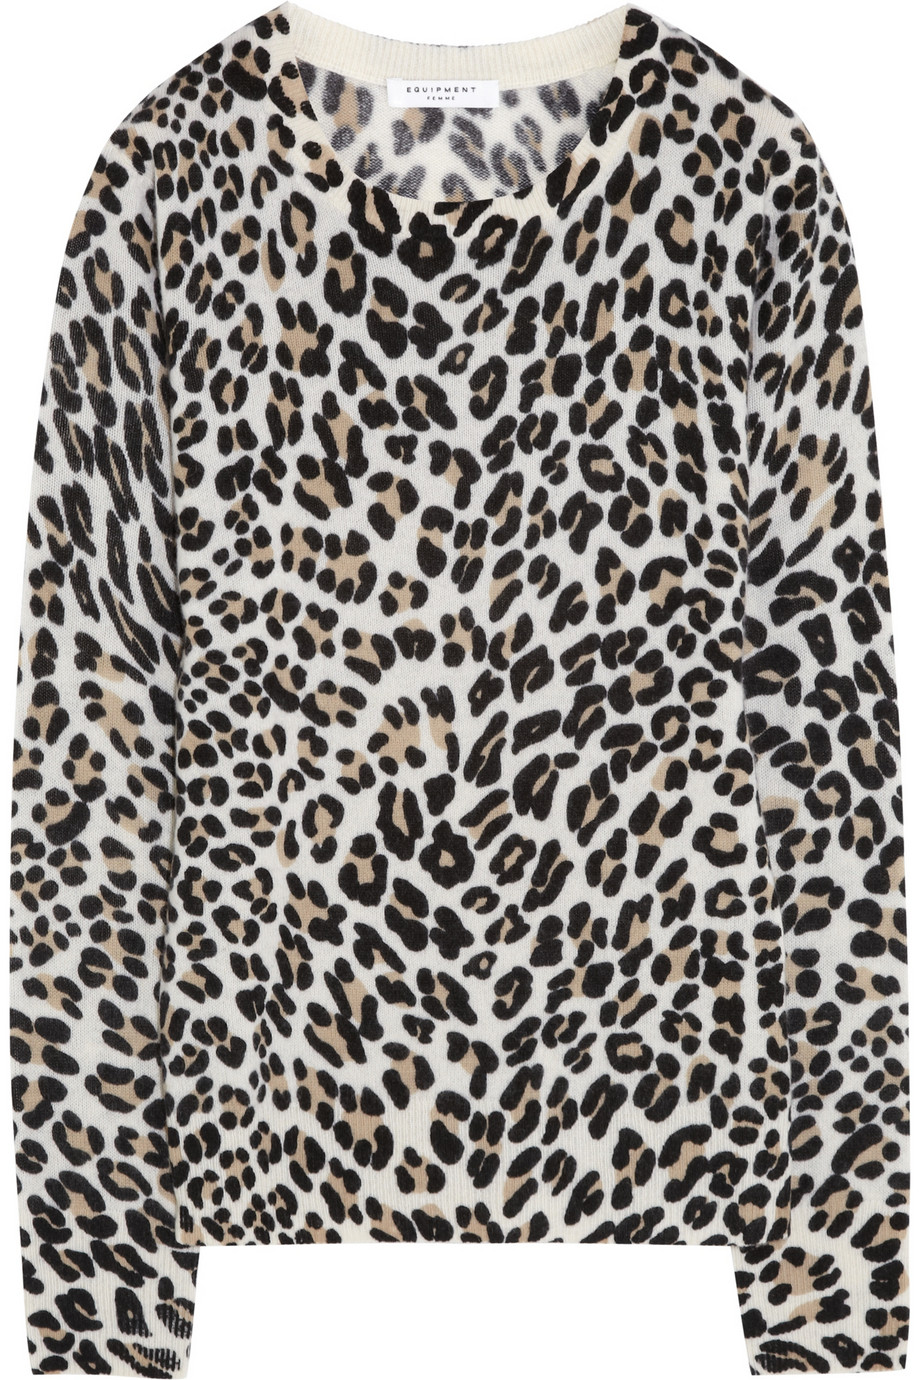 Equipment Shane Leopard Print Cashmere Sweater in Black | Lyst